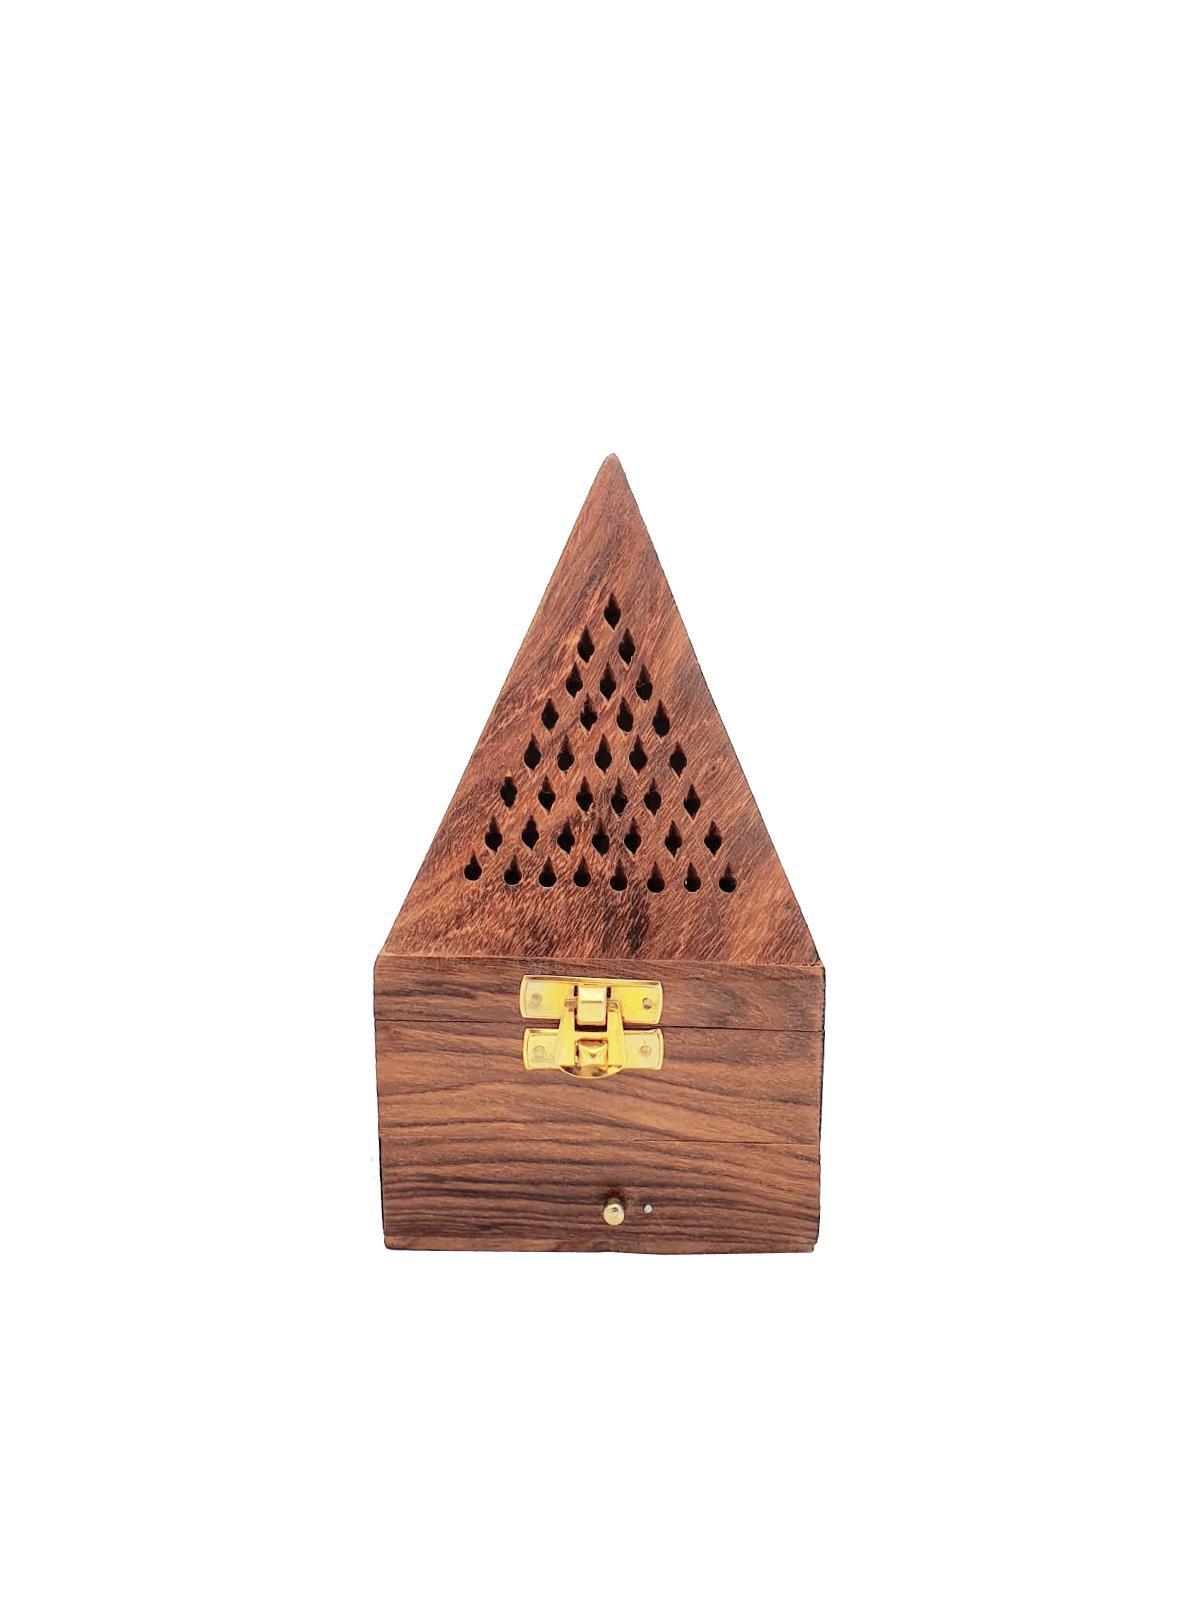 Buy Wooden Pyramid Incense Burner - Medium